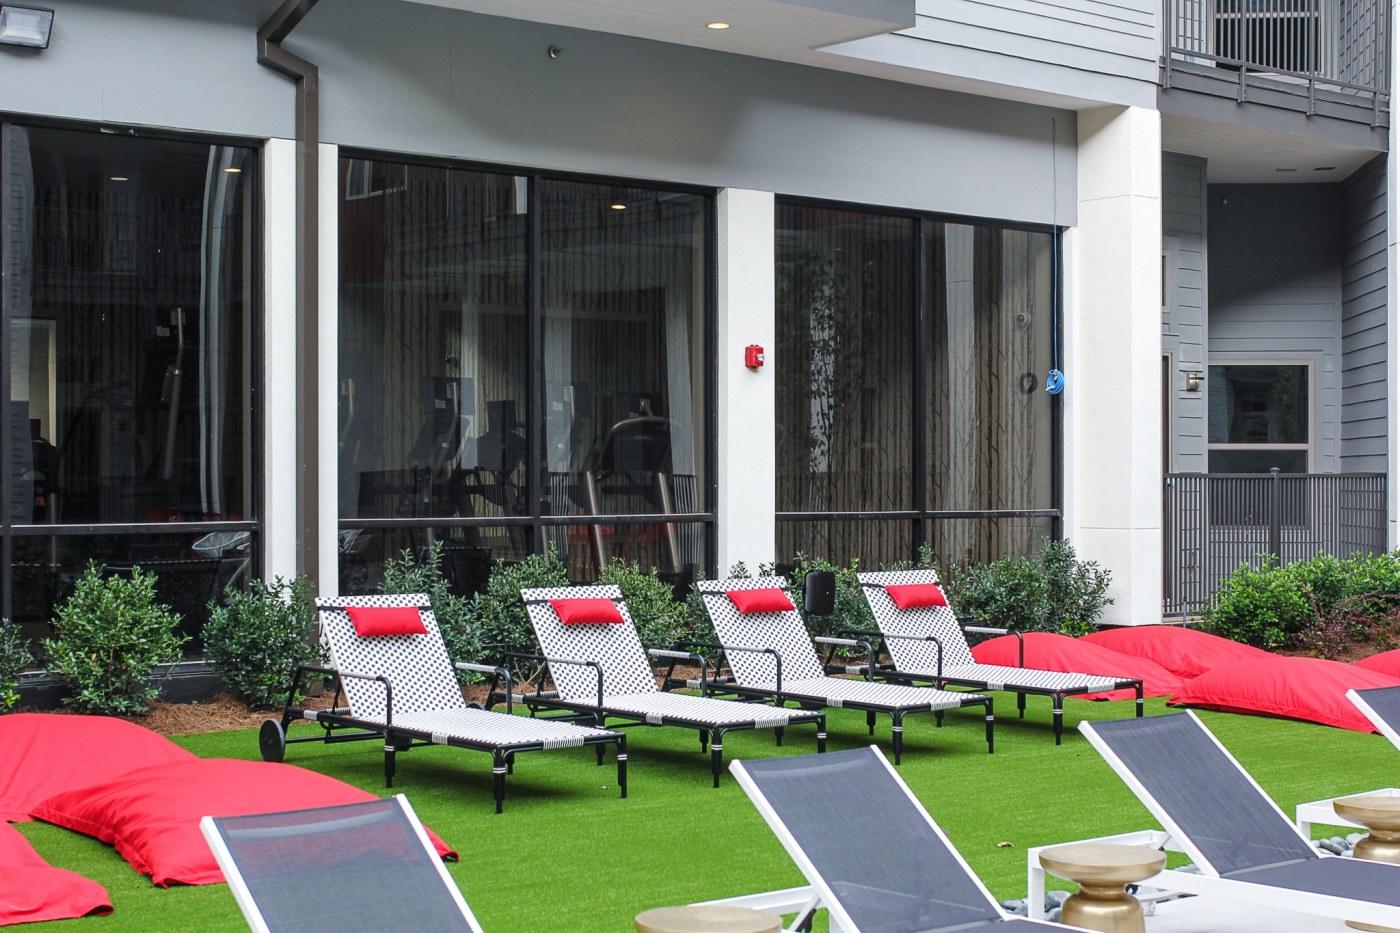 Birmingham, Alabama, The Metropolitan, UAB medical student housing options, pool, lounge chairs